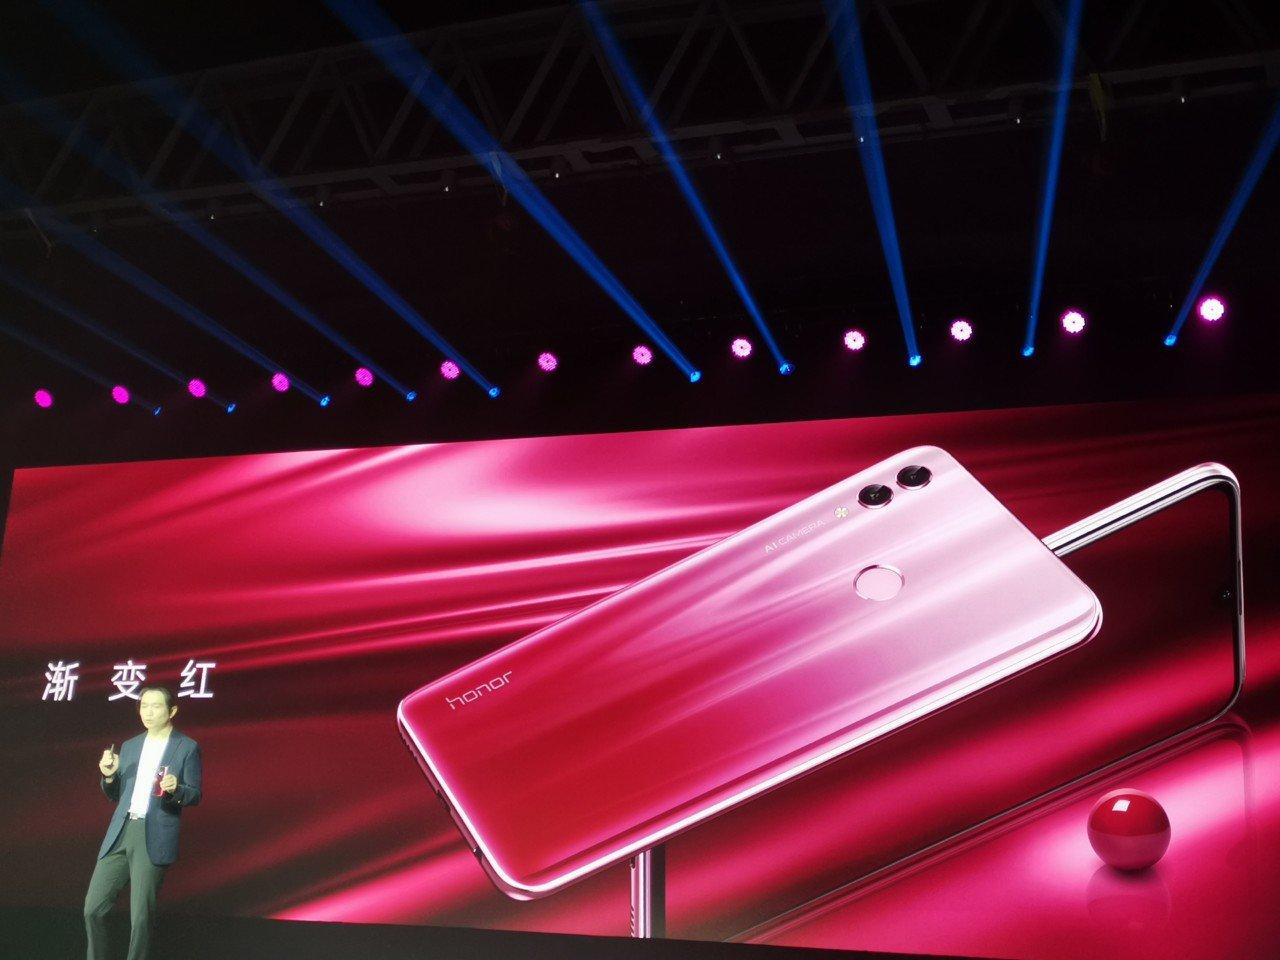 Представлен смартфон Honor 10 Lite экран диагональю 6,2 дюйма платформа Kirin 710 и сдвоенная камера за $200